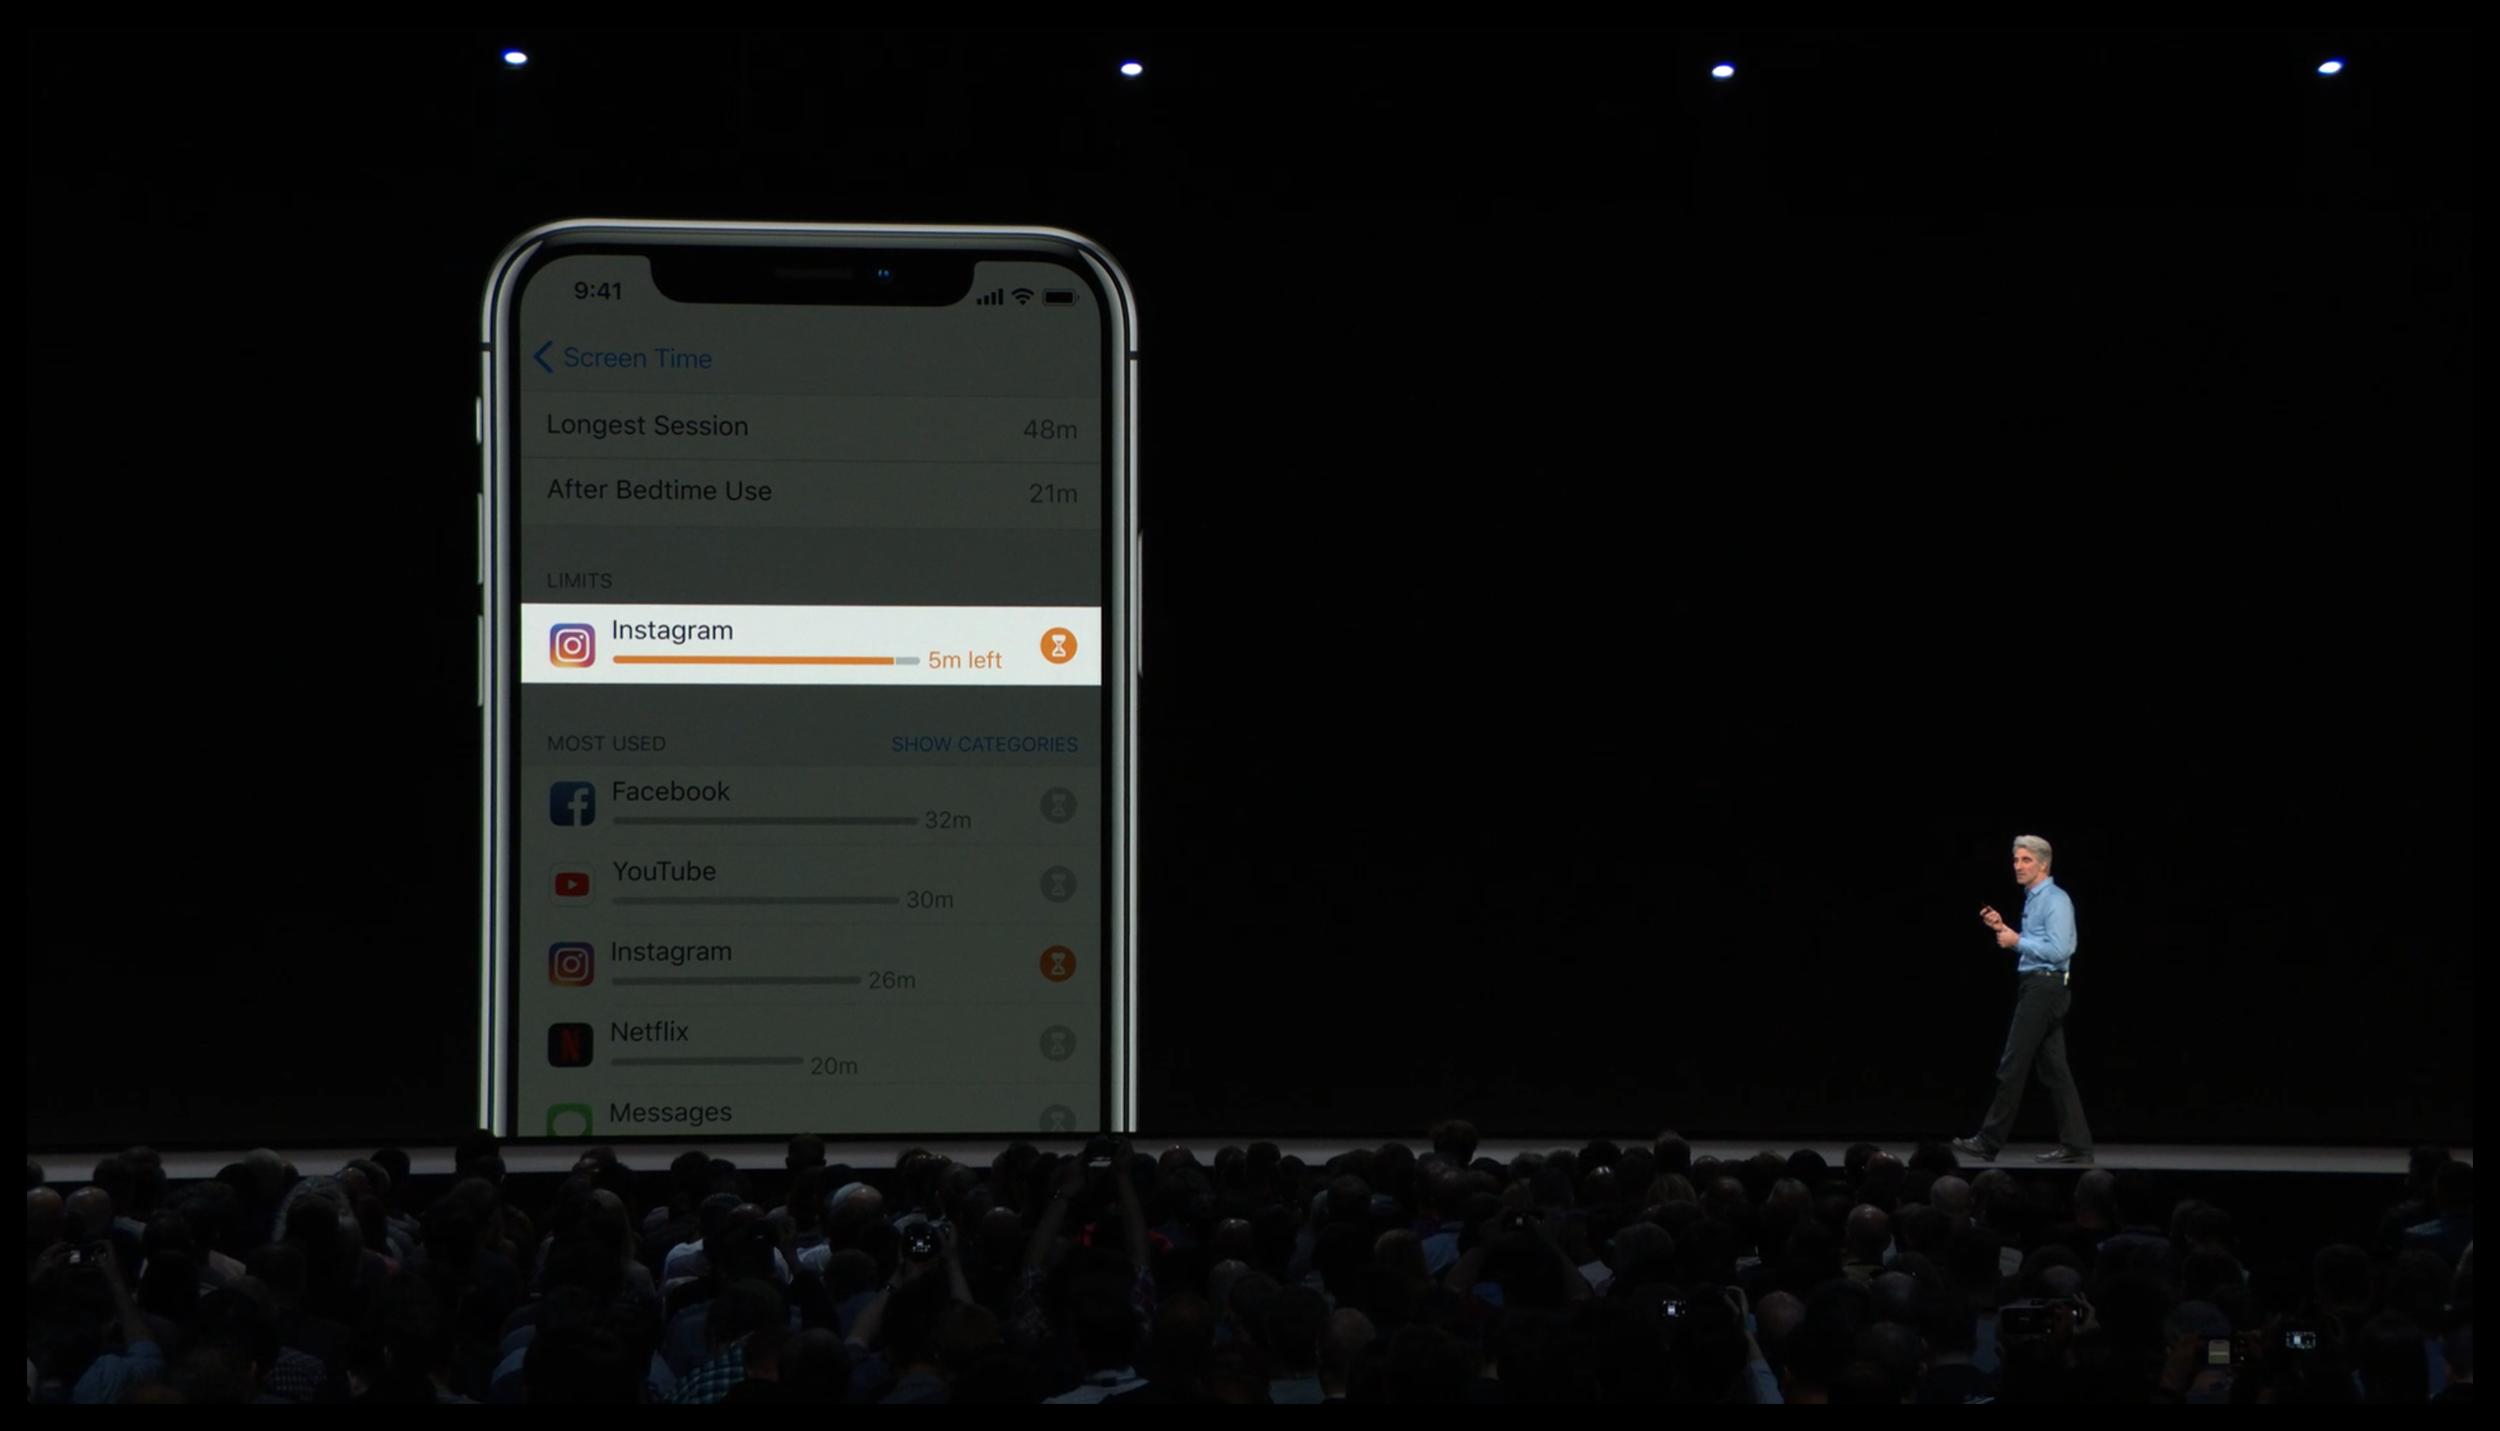 Screenshot 2018-06-10 01.20.27.png